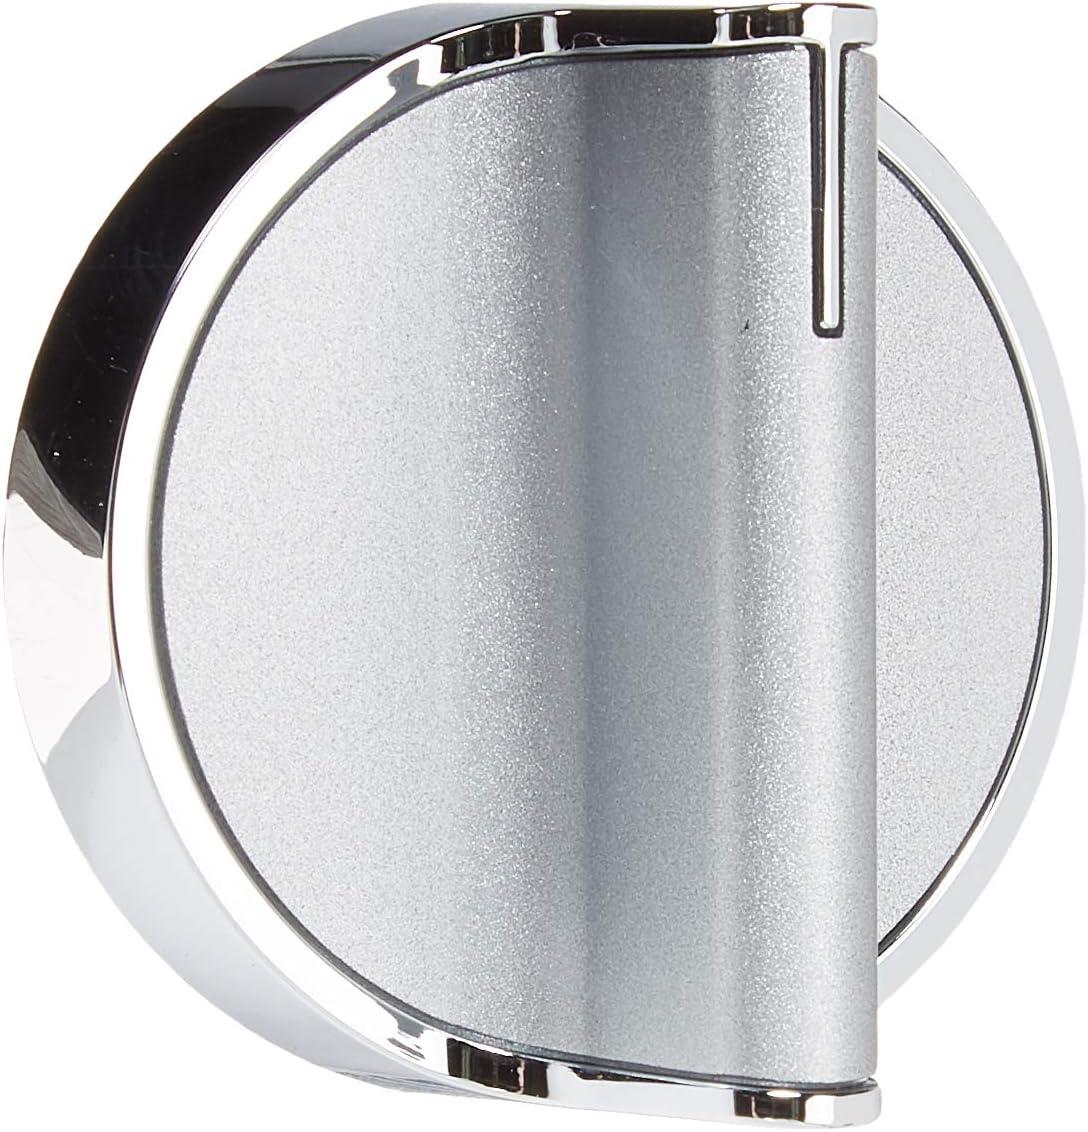 Whirlpool W10594481 Control Knob